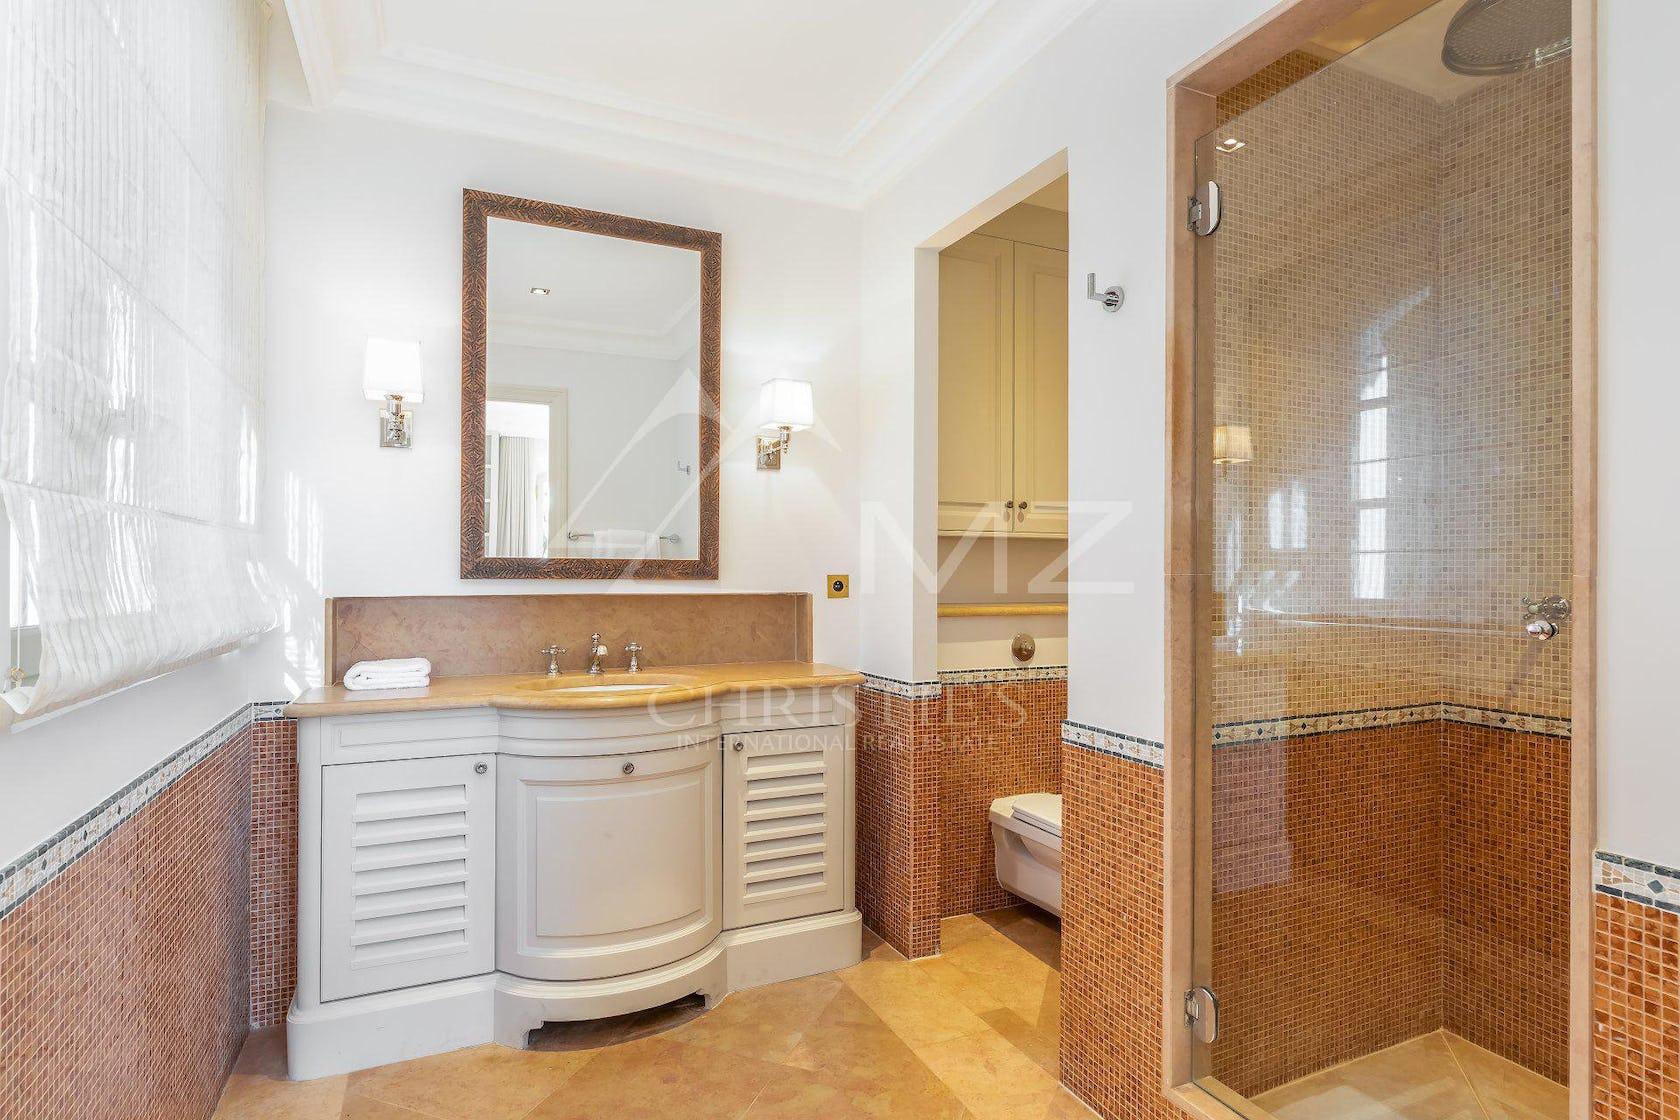 flooring wood floor interior design indoors hardwood corner room